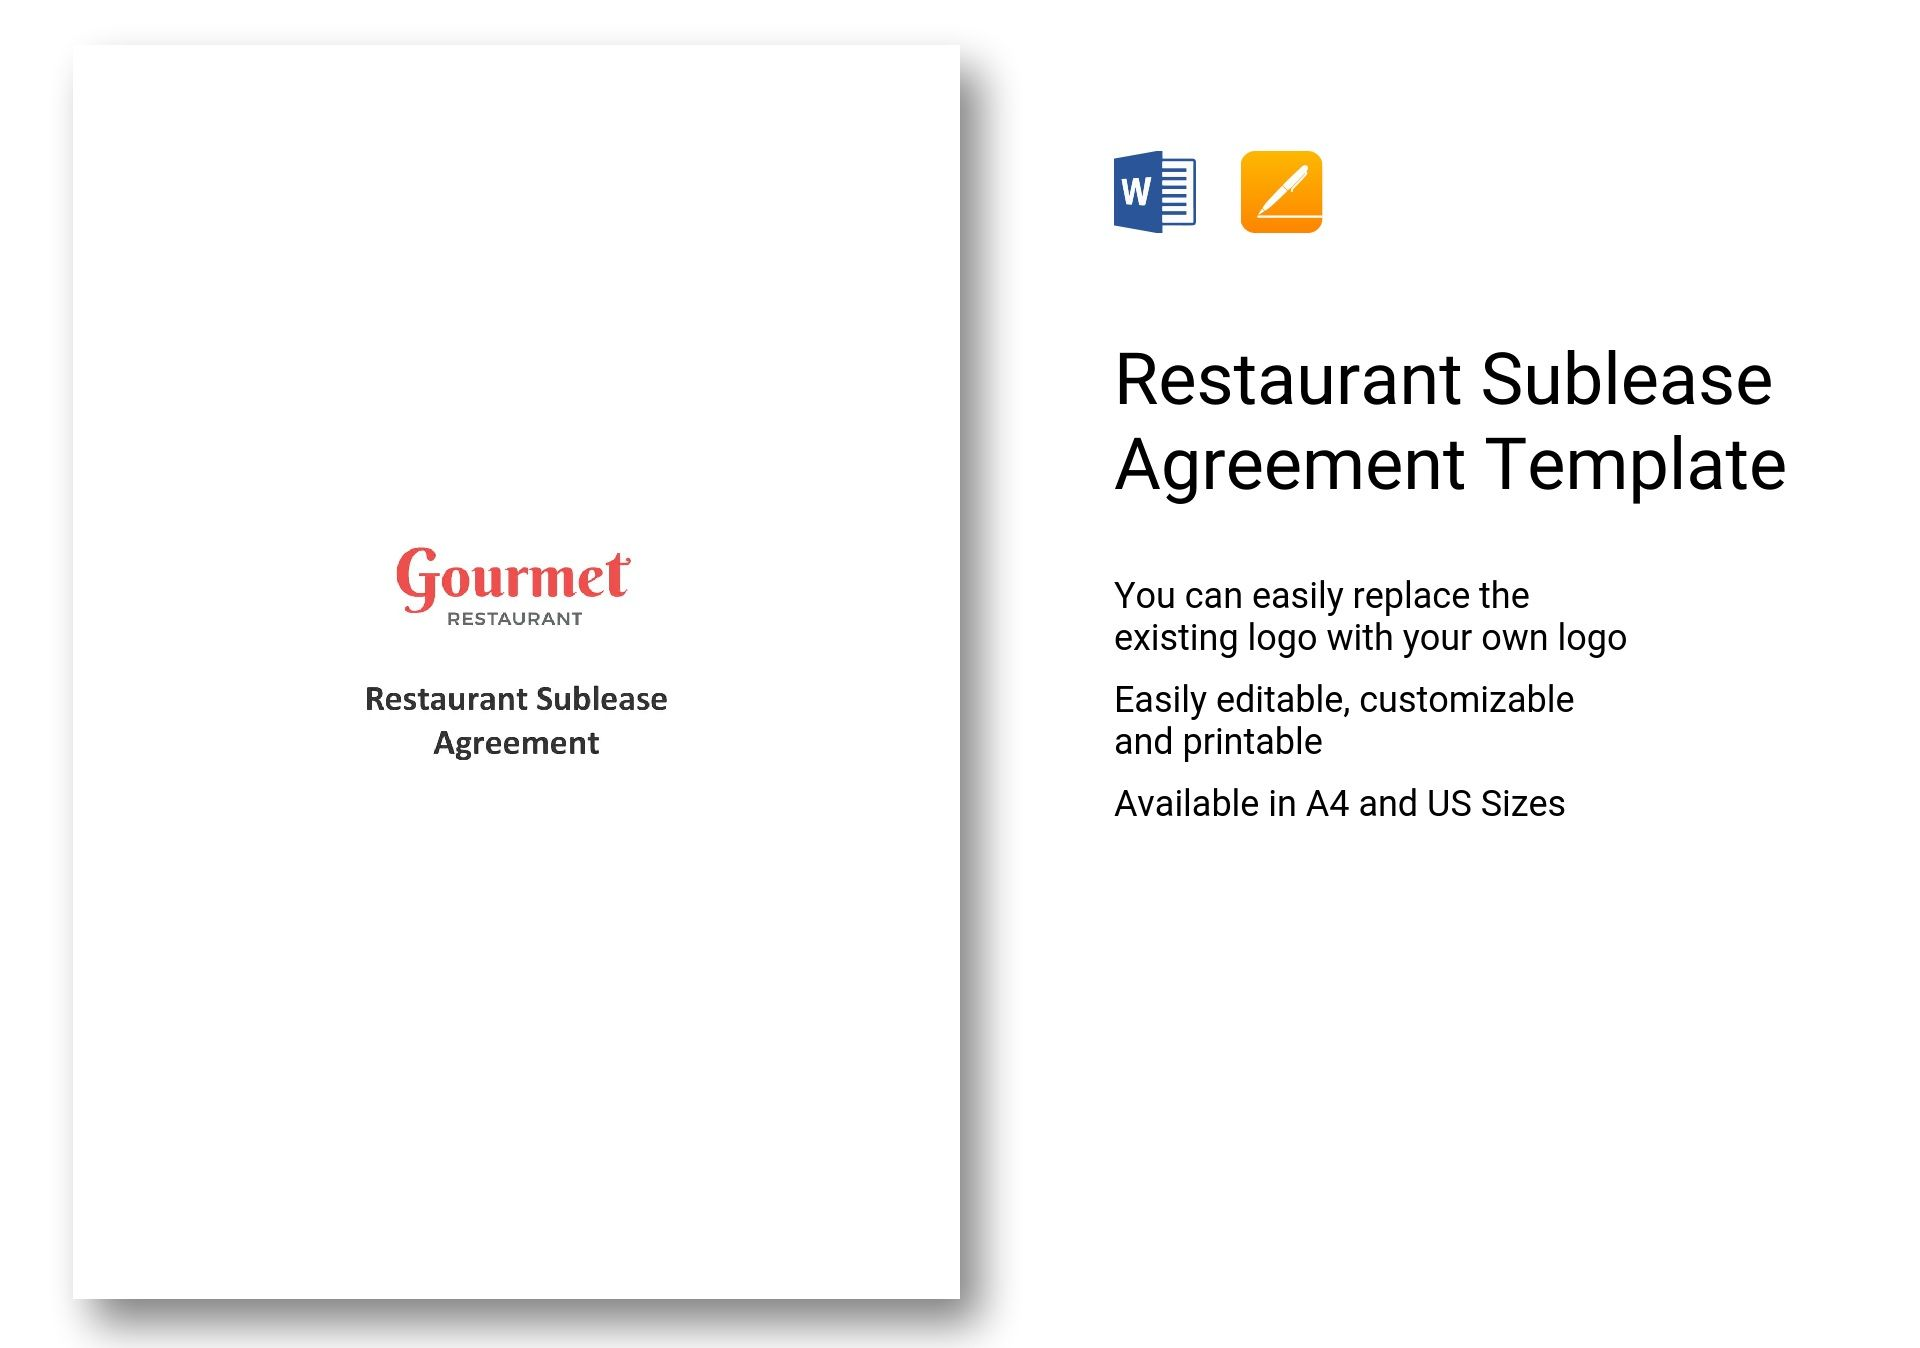 Restaurant Sublease Agreement